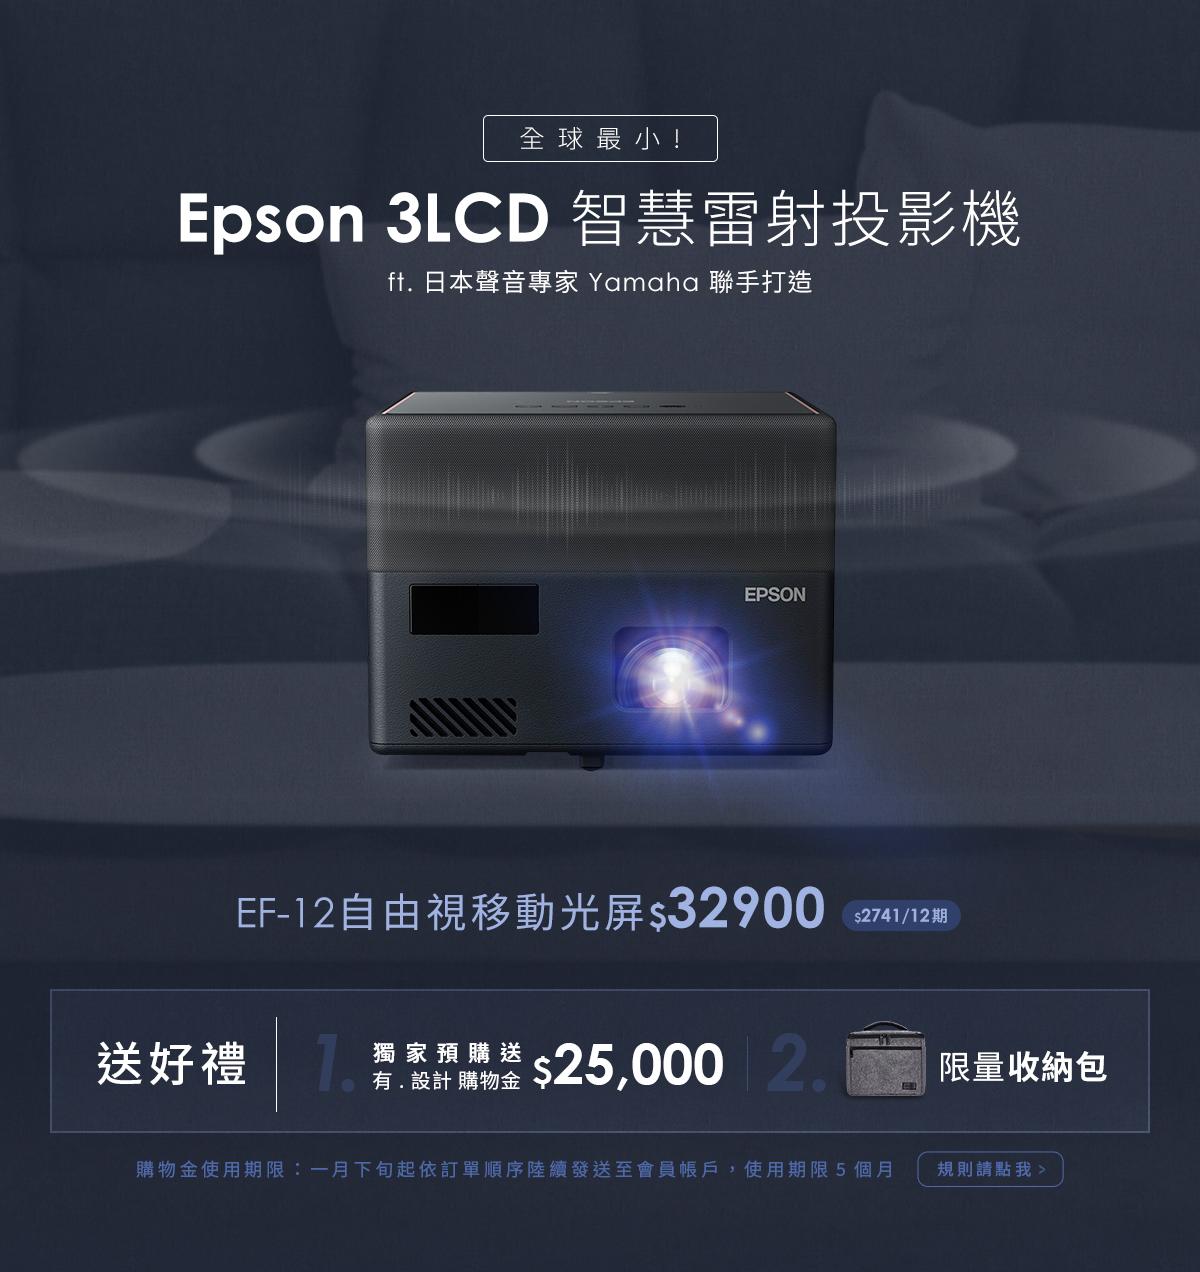 EPSON-EF-12